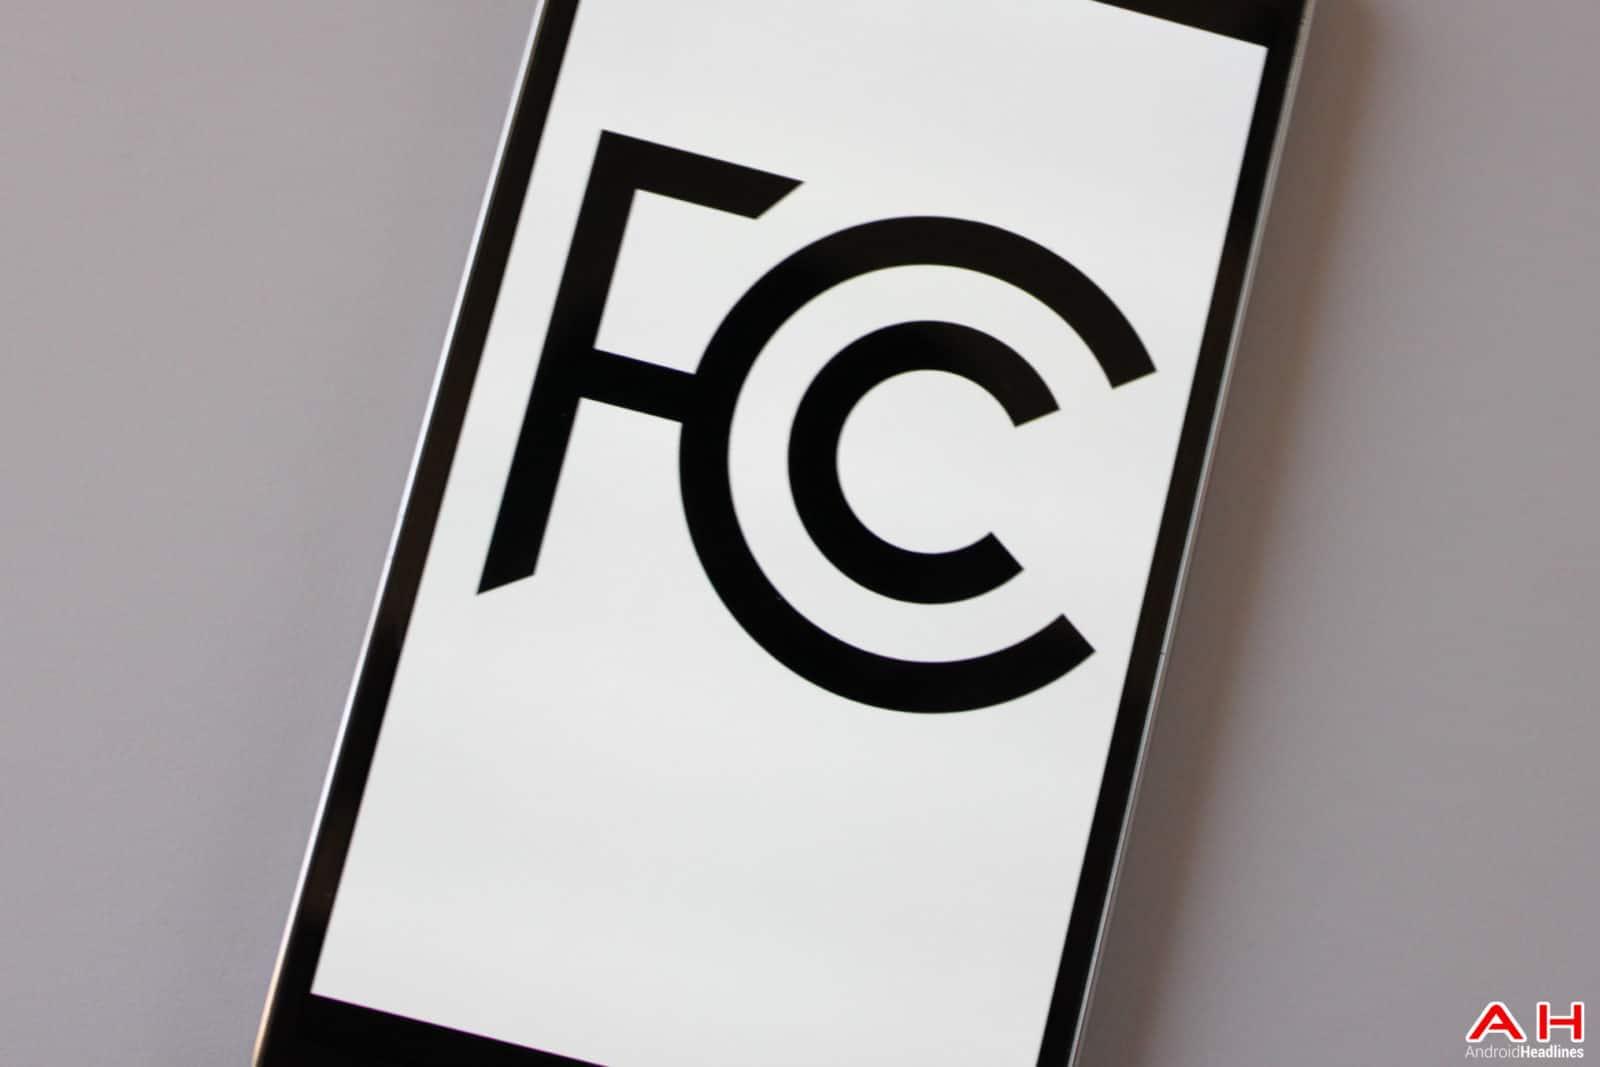 AH FCC LOGO-5